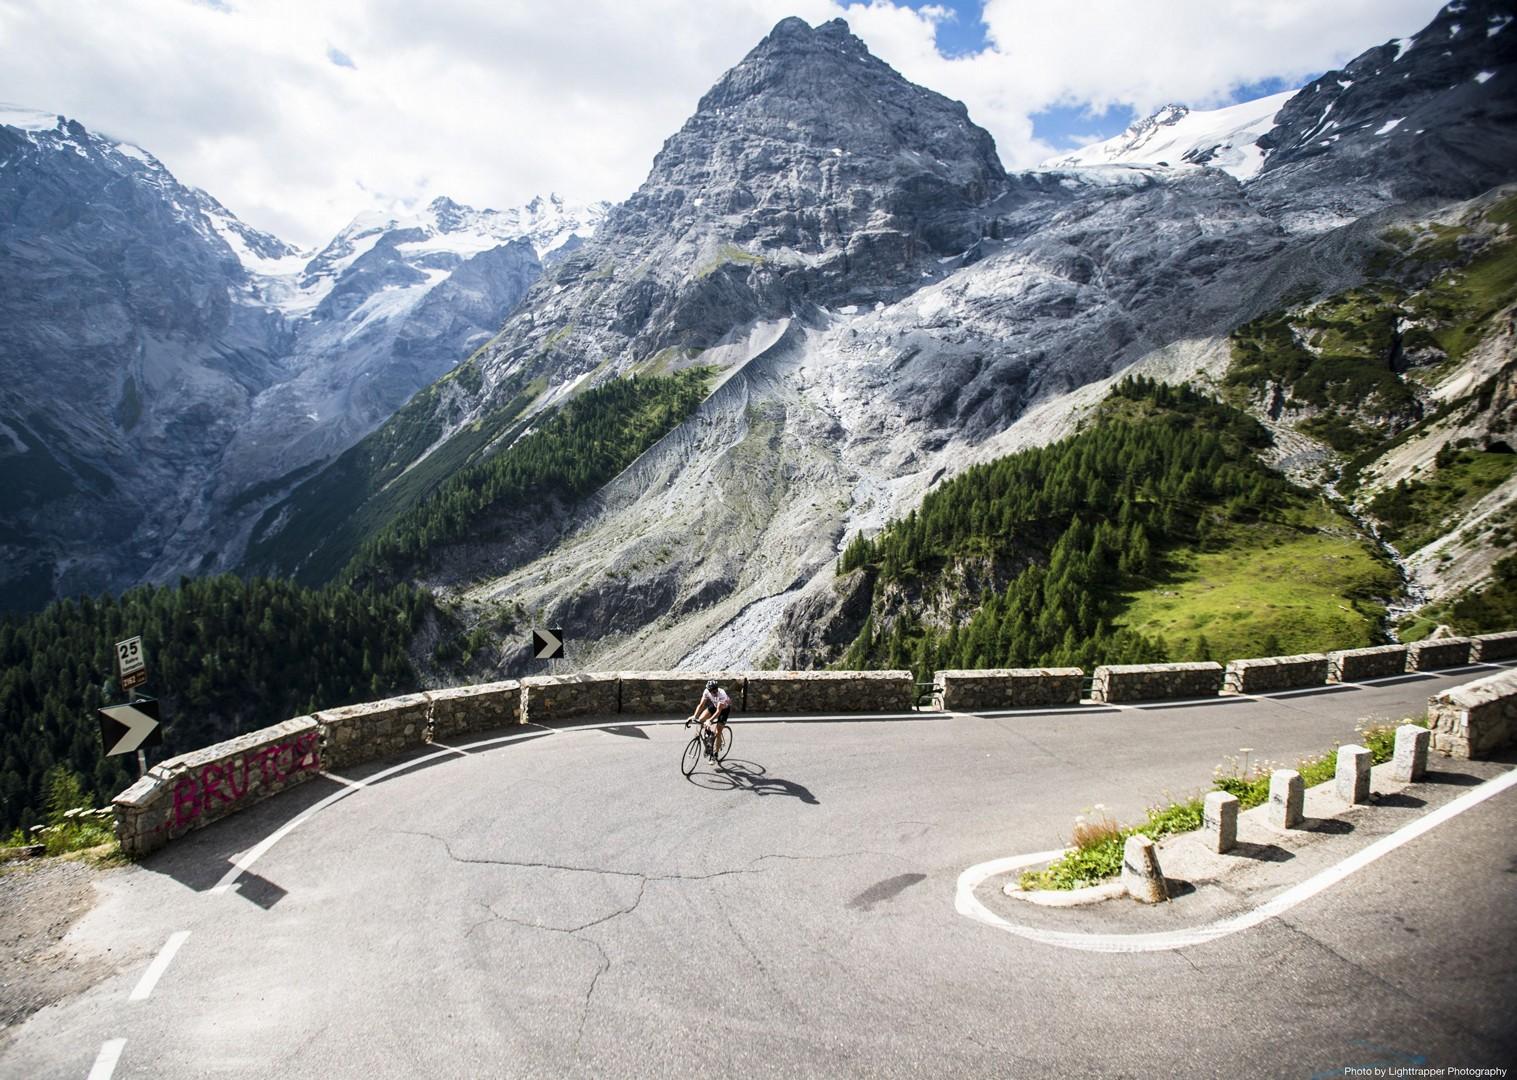 italy-italian-alps-guided-road-cycling-holiday.jpg - Italy - Alps and Dolomites - Giants of the Giro - Guided Road Cycling Holiday - Road Cycling